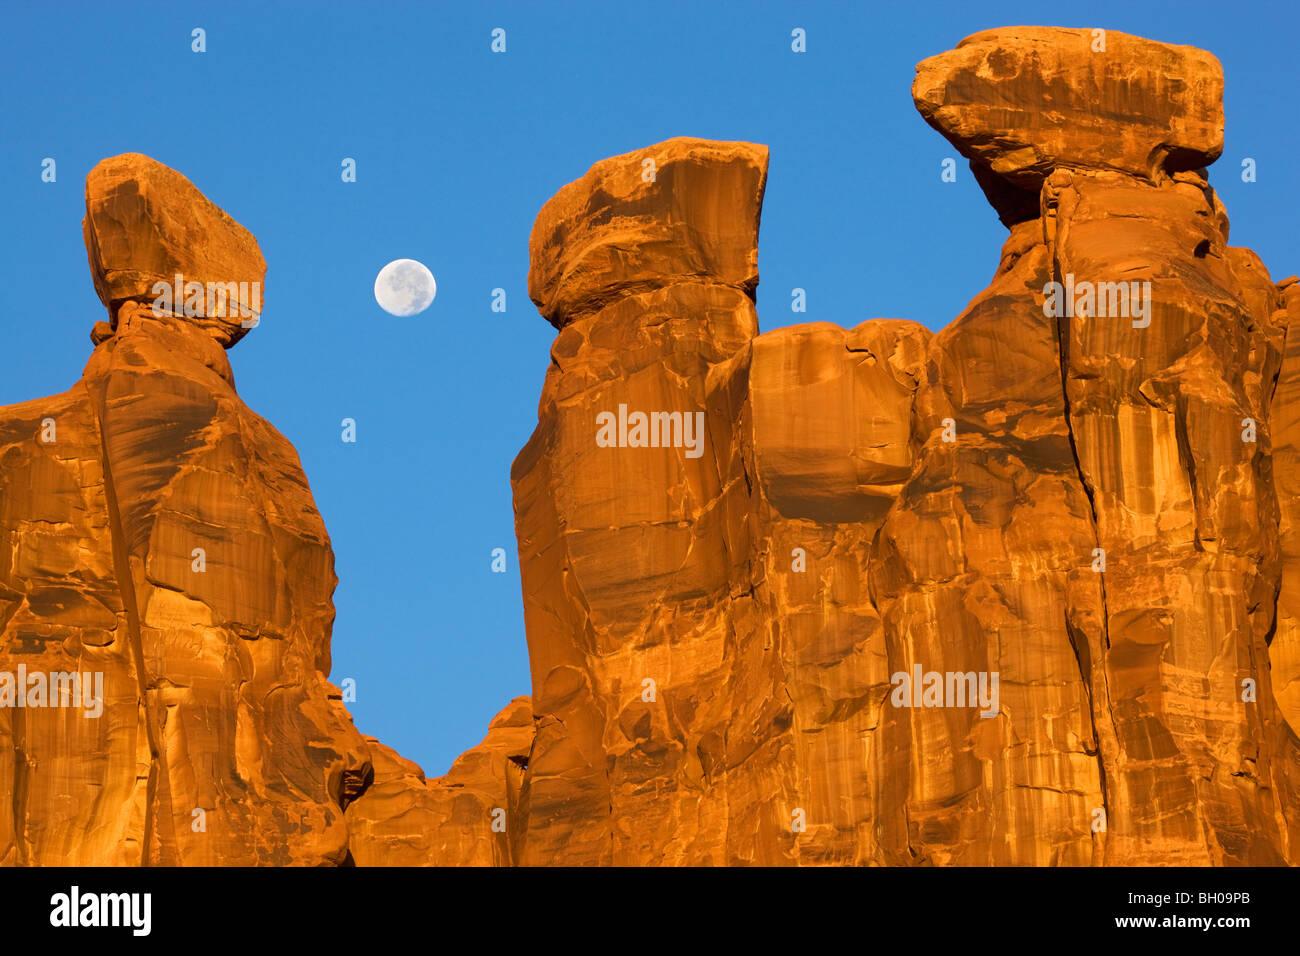 Cerca de la luna llena, junto con los tres Chismorrea, Arches National Park, cerca de Moab, Utah. Imagen De Stock